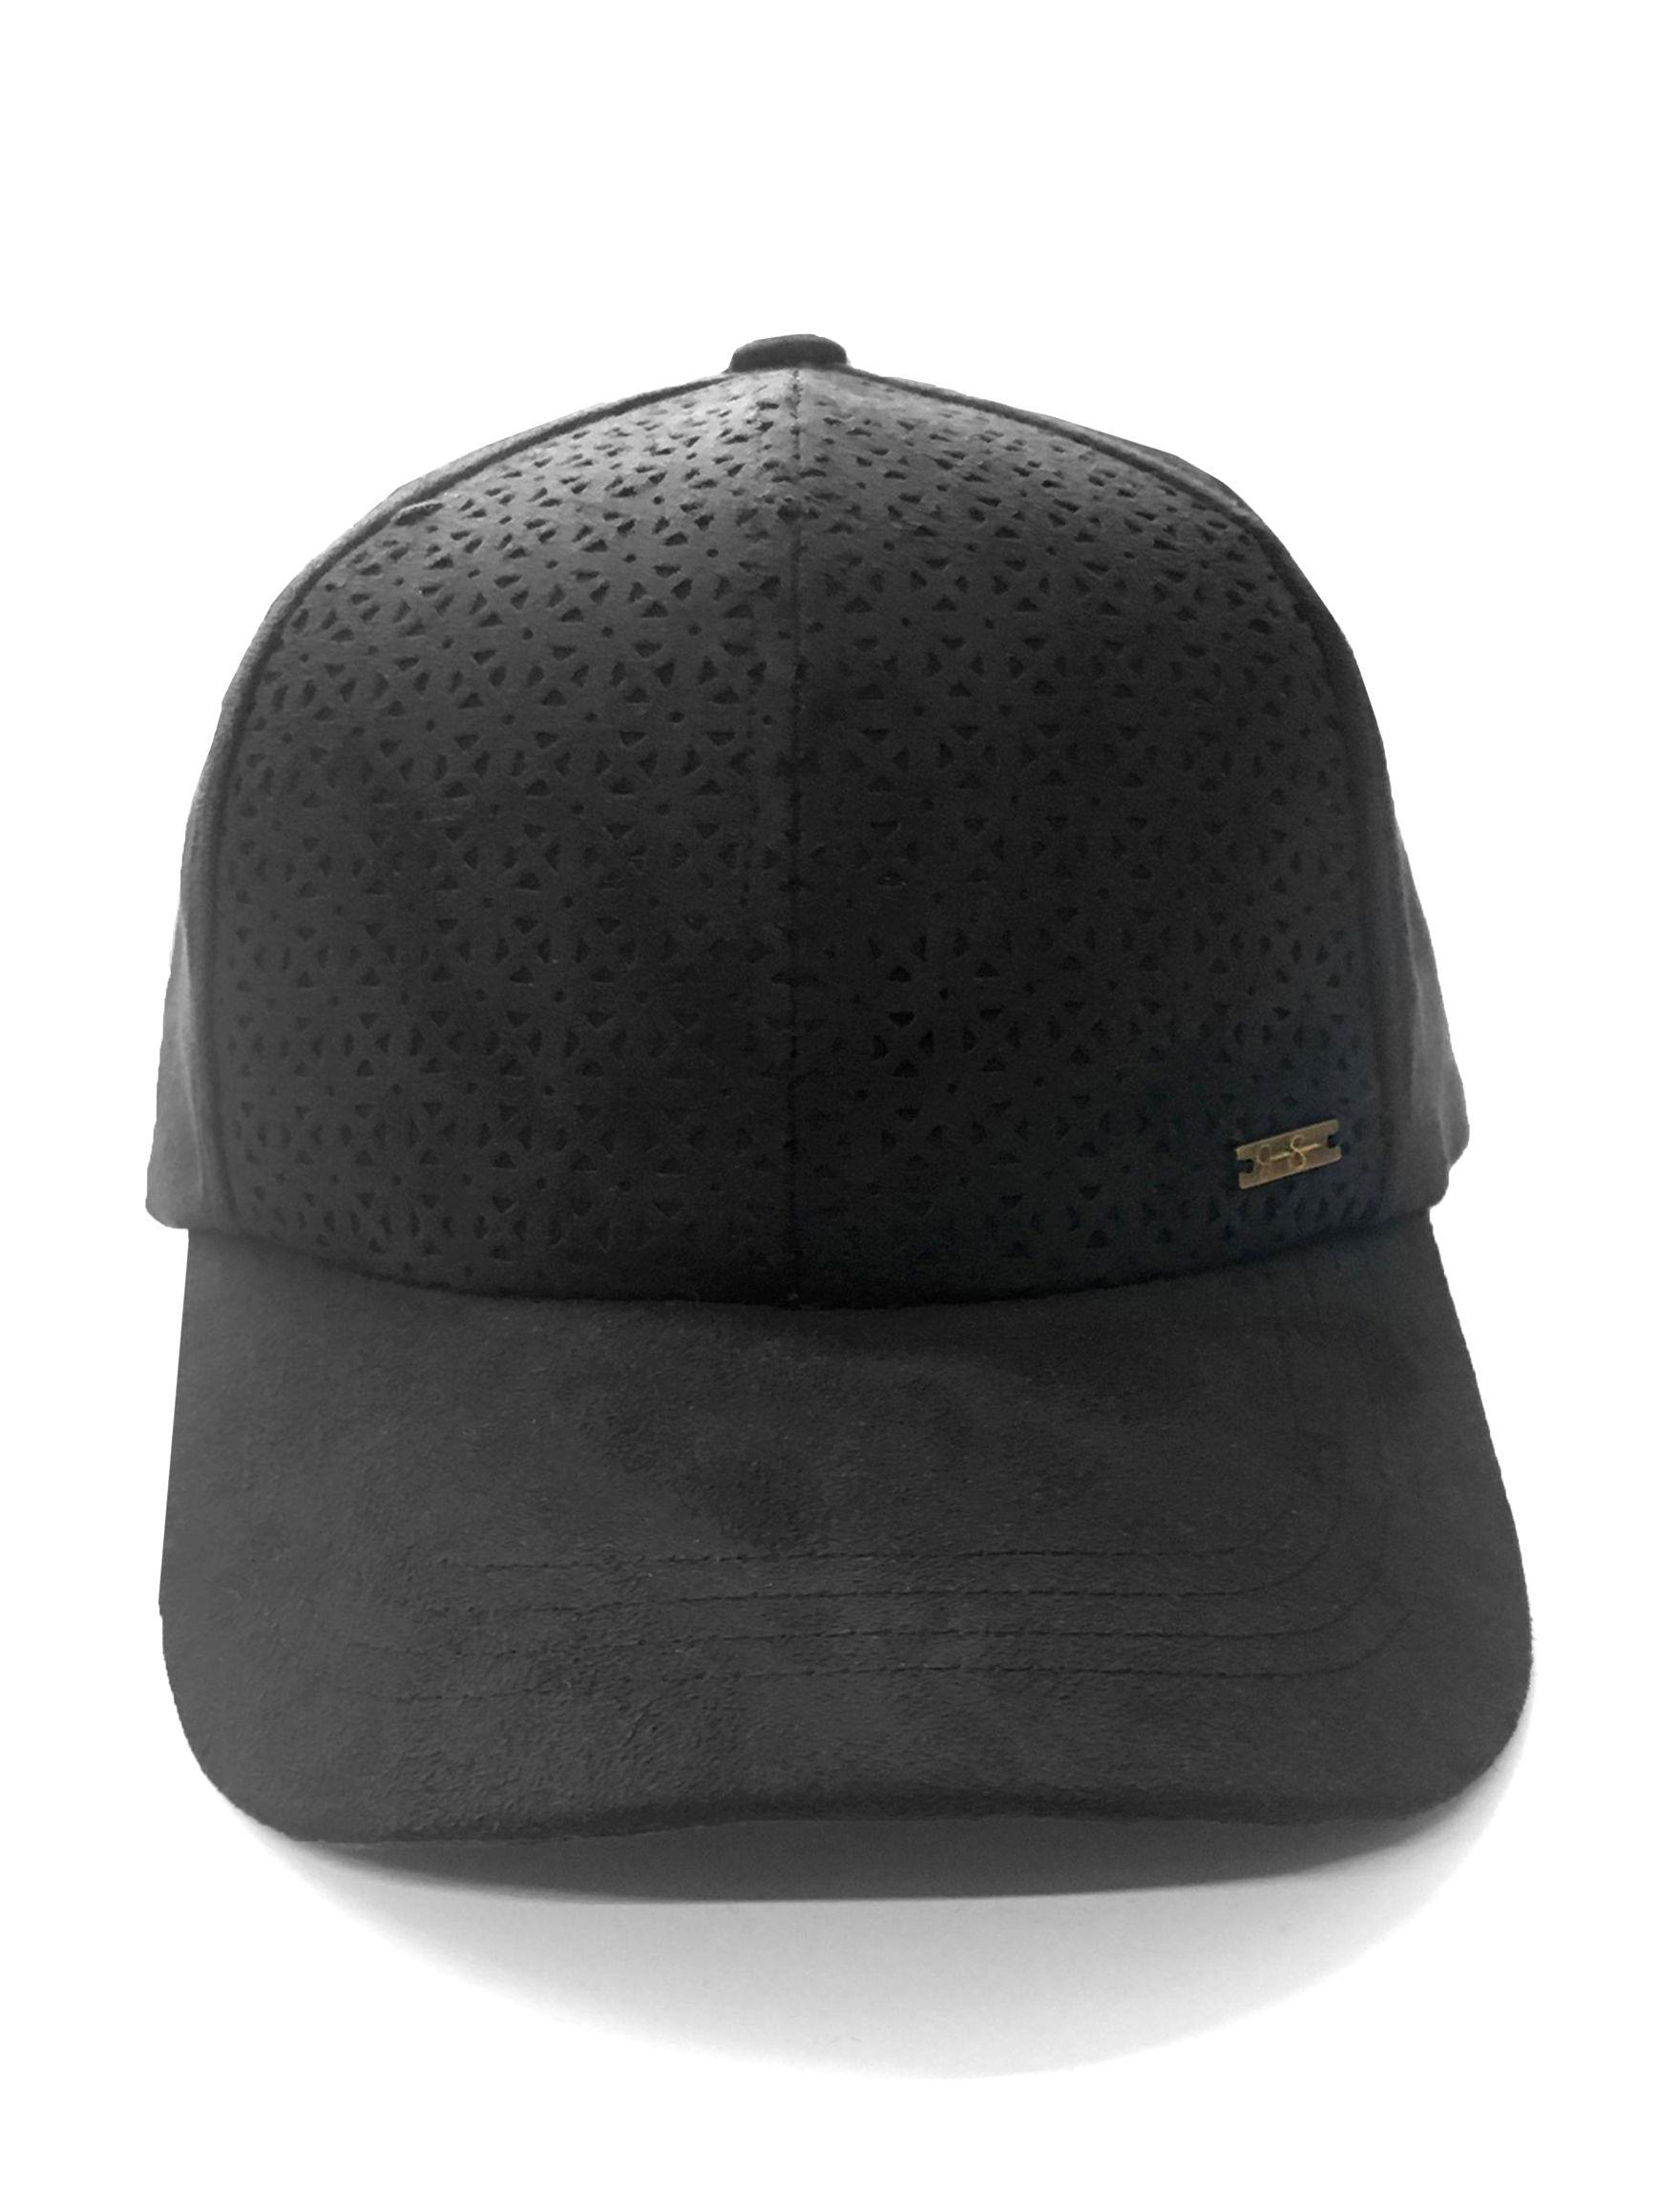 Jessica Simpson Black Hats & Headwear